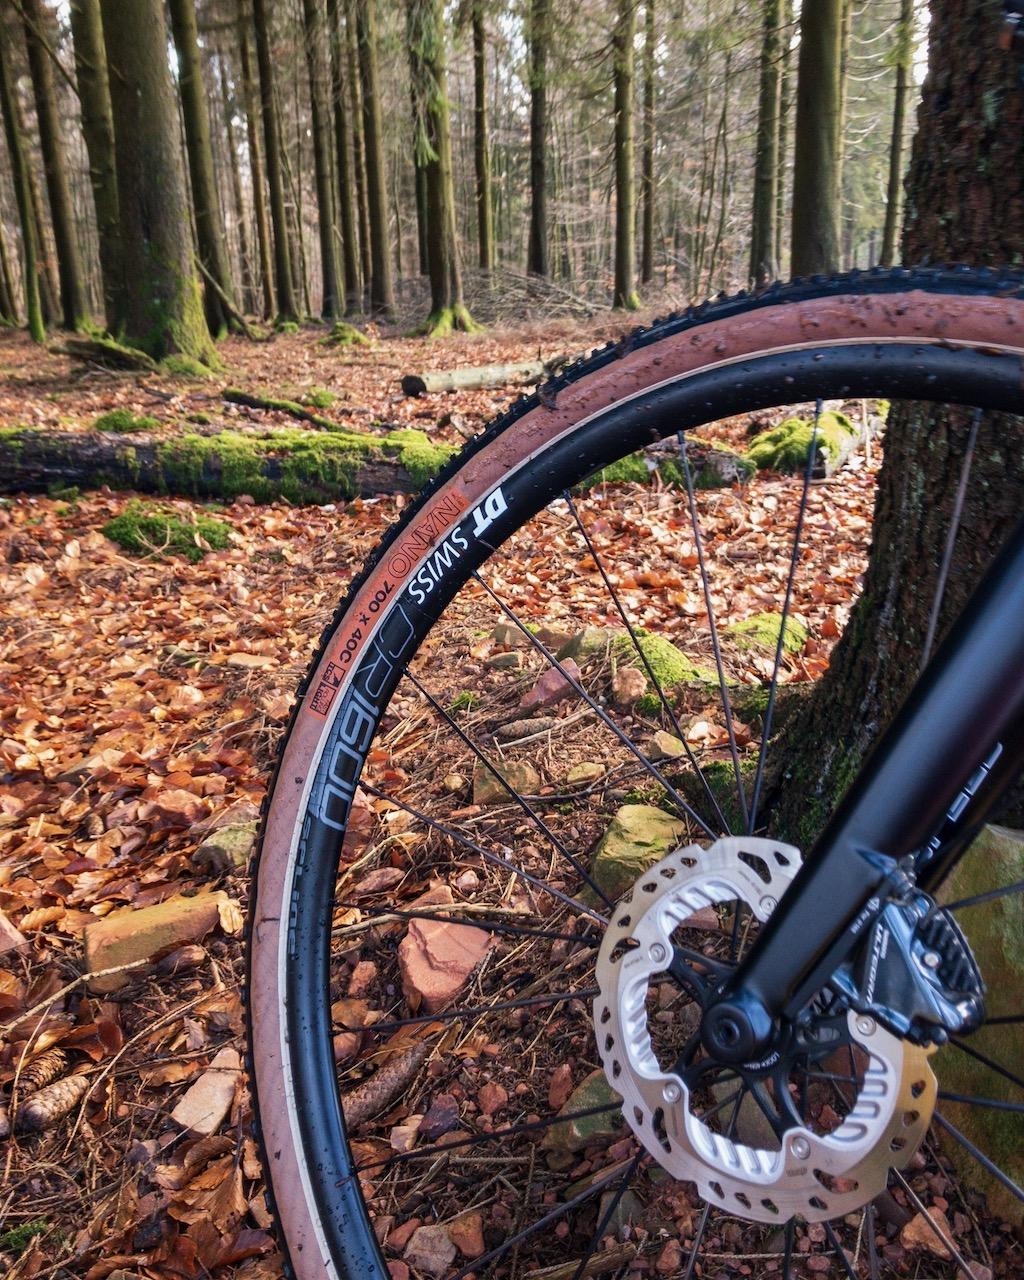 Wtb NANO 40 on DT Swiss CR1600 Spline db 23 wheels in the forest